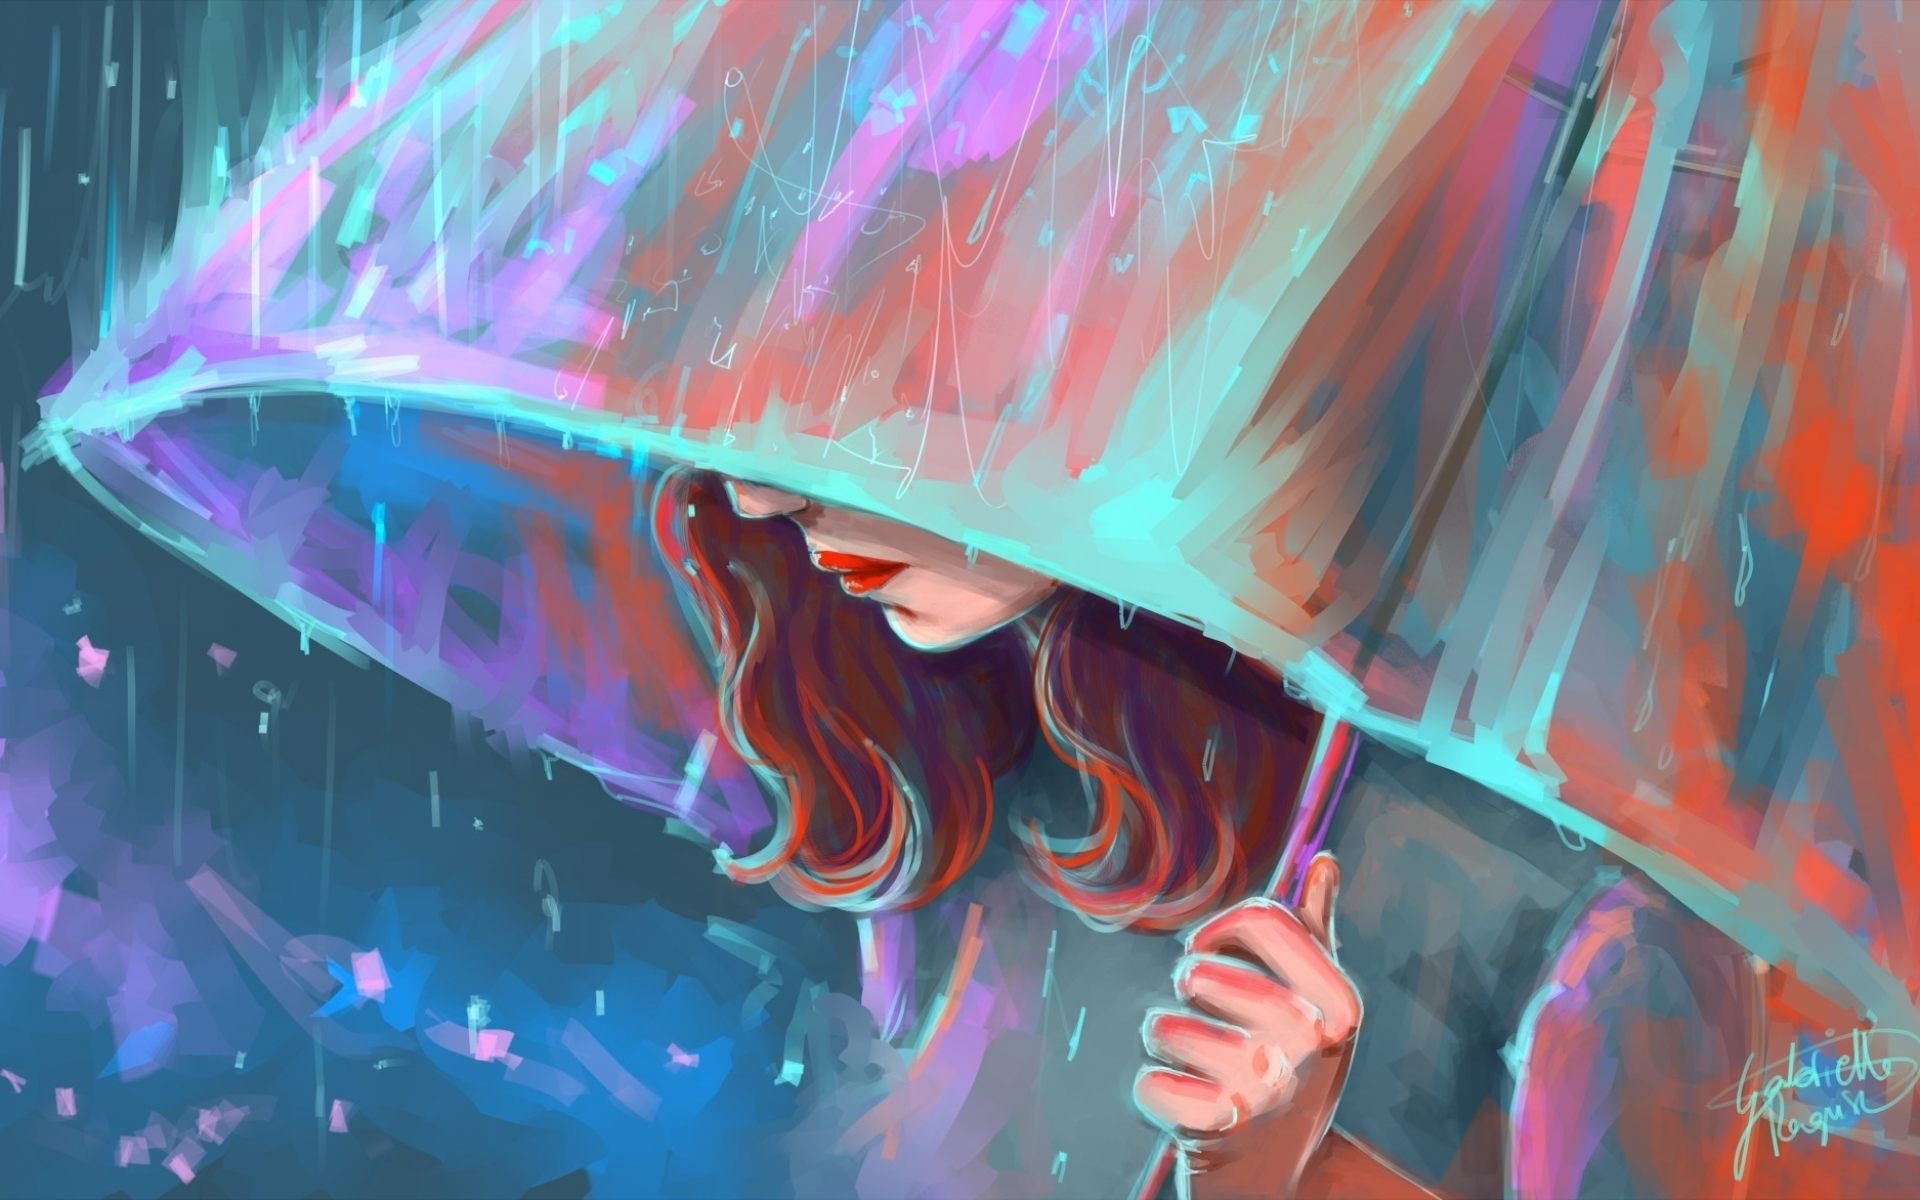 Girl Painting Artistic Art Wallpaper HD Download For Desktop